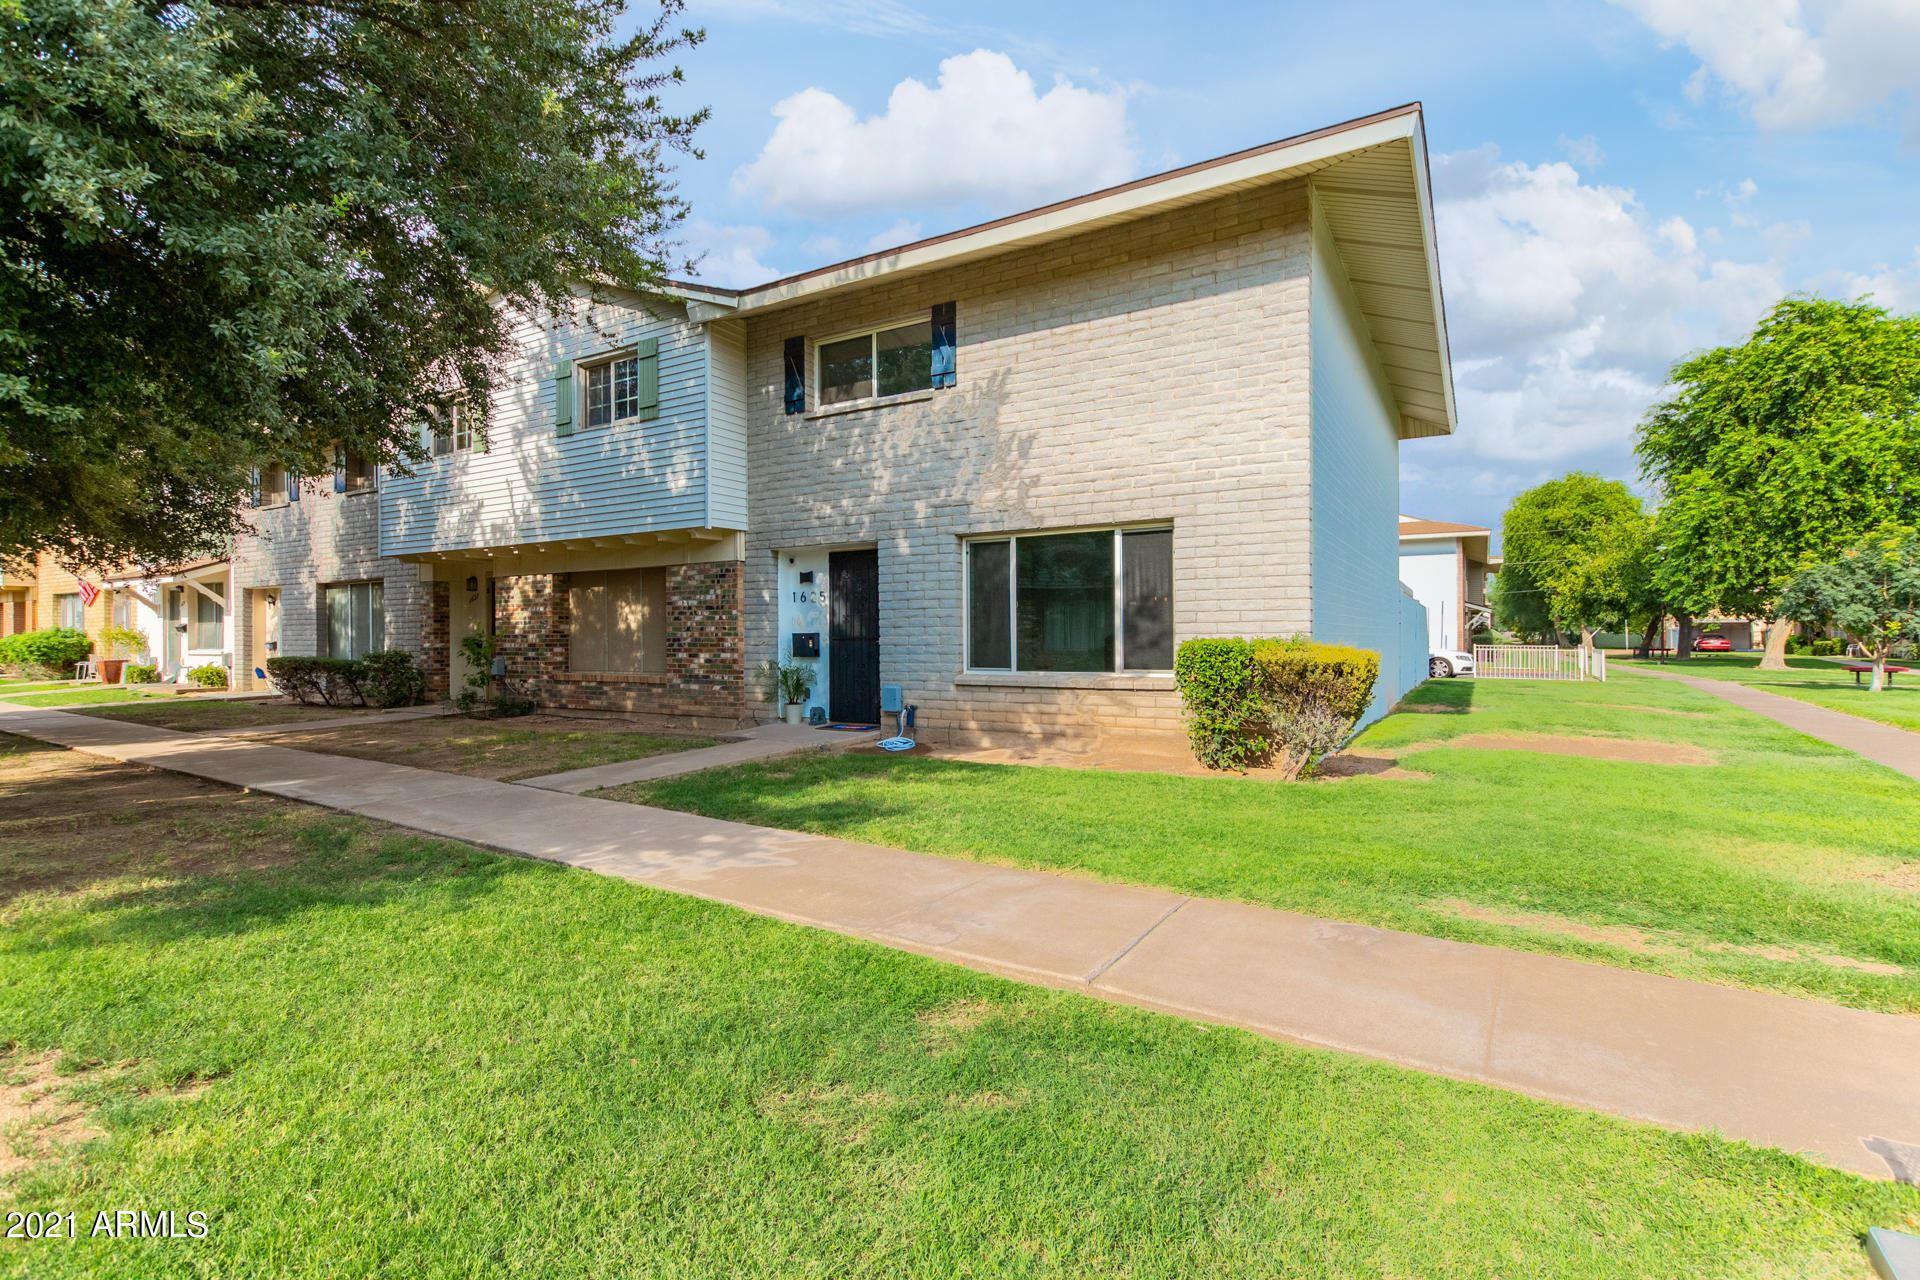 1625 W HAZELWOOD Street, Phoenix, AZ 85015 - MLS#: 6266840